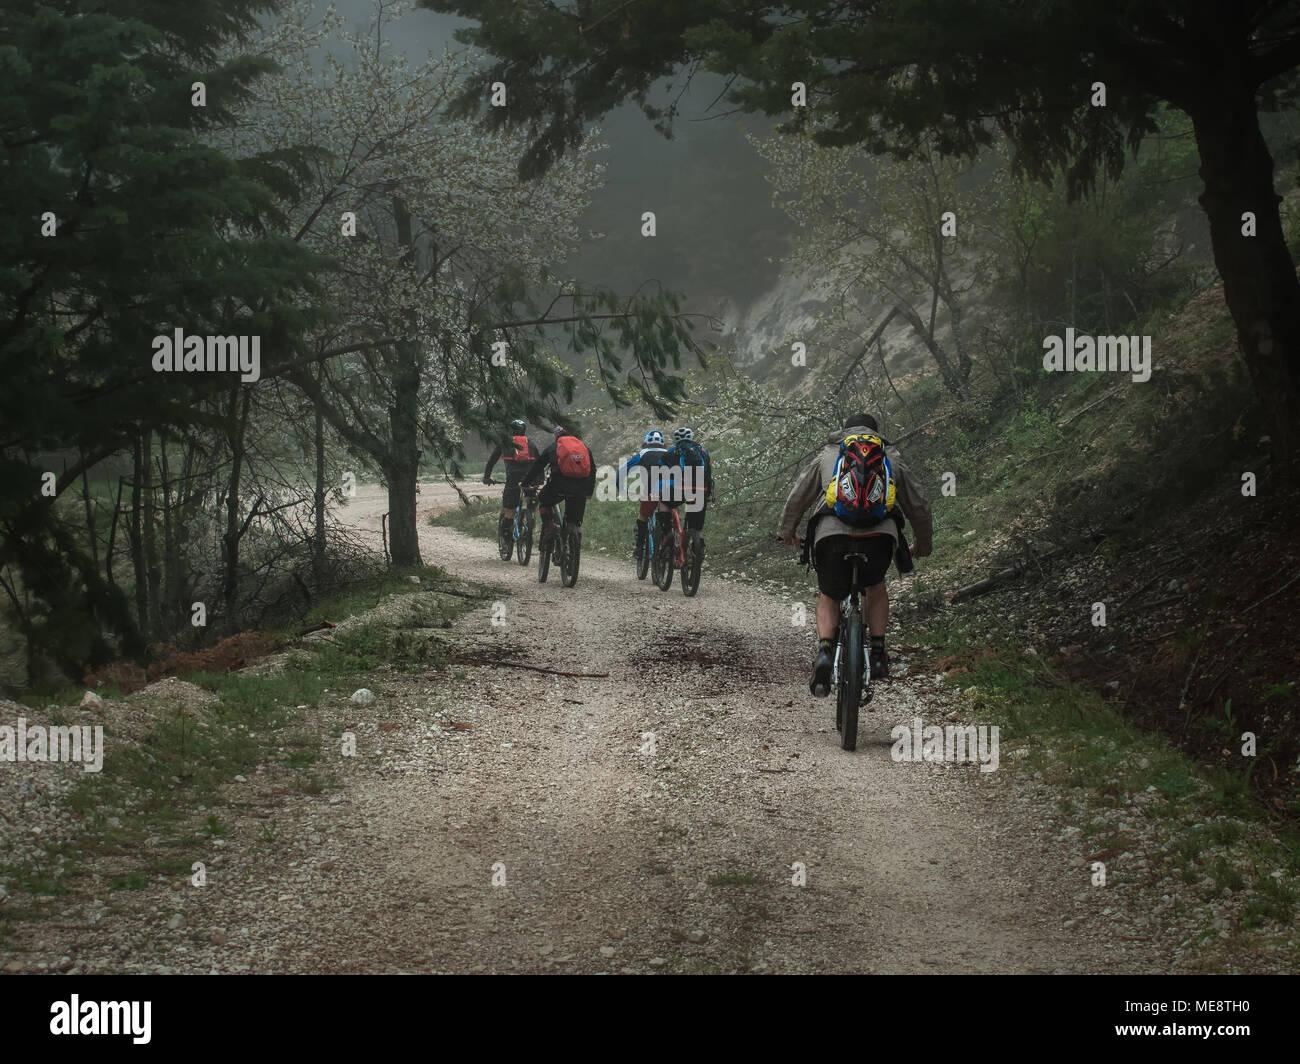 mountin bikers in the haze - Stock Image